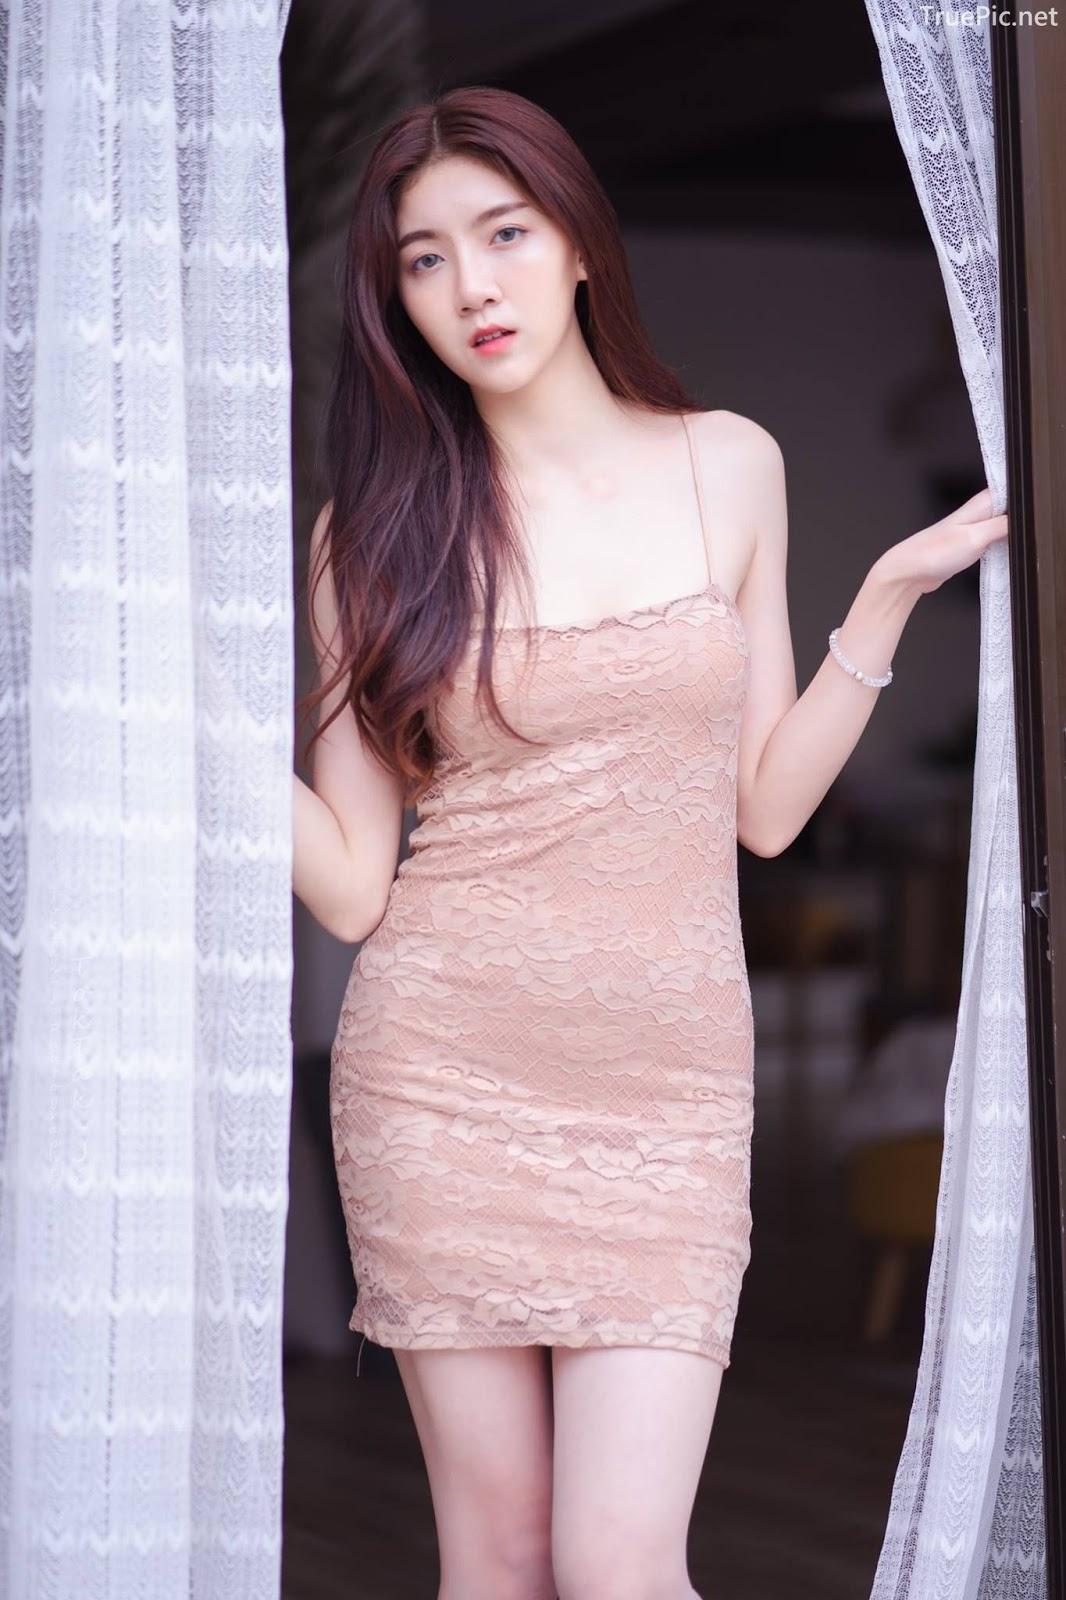 Thailand angel model Sasi Ngiunwan - Beauty portrait photoshoot - Picture 10